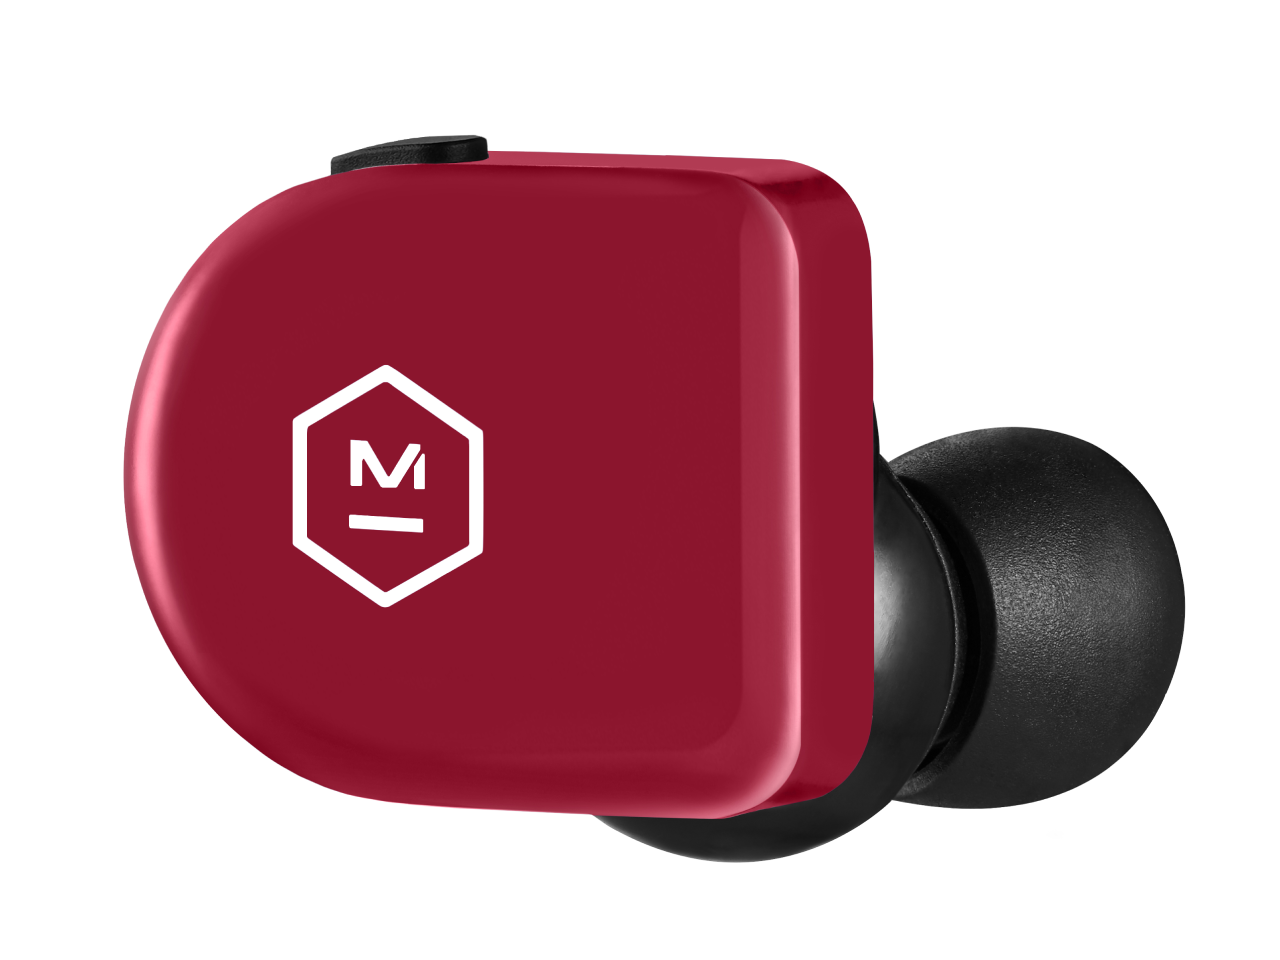 Master & Dynamic's MW07 Go is a $199 AirPod alternative